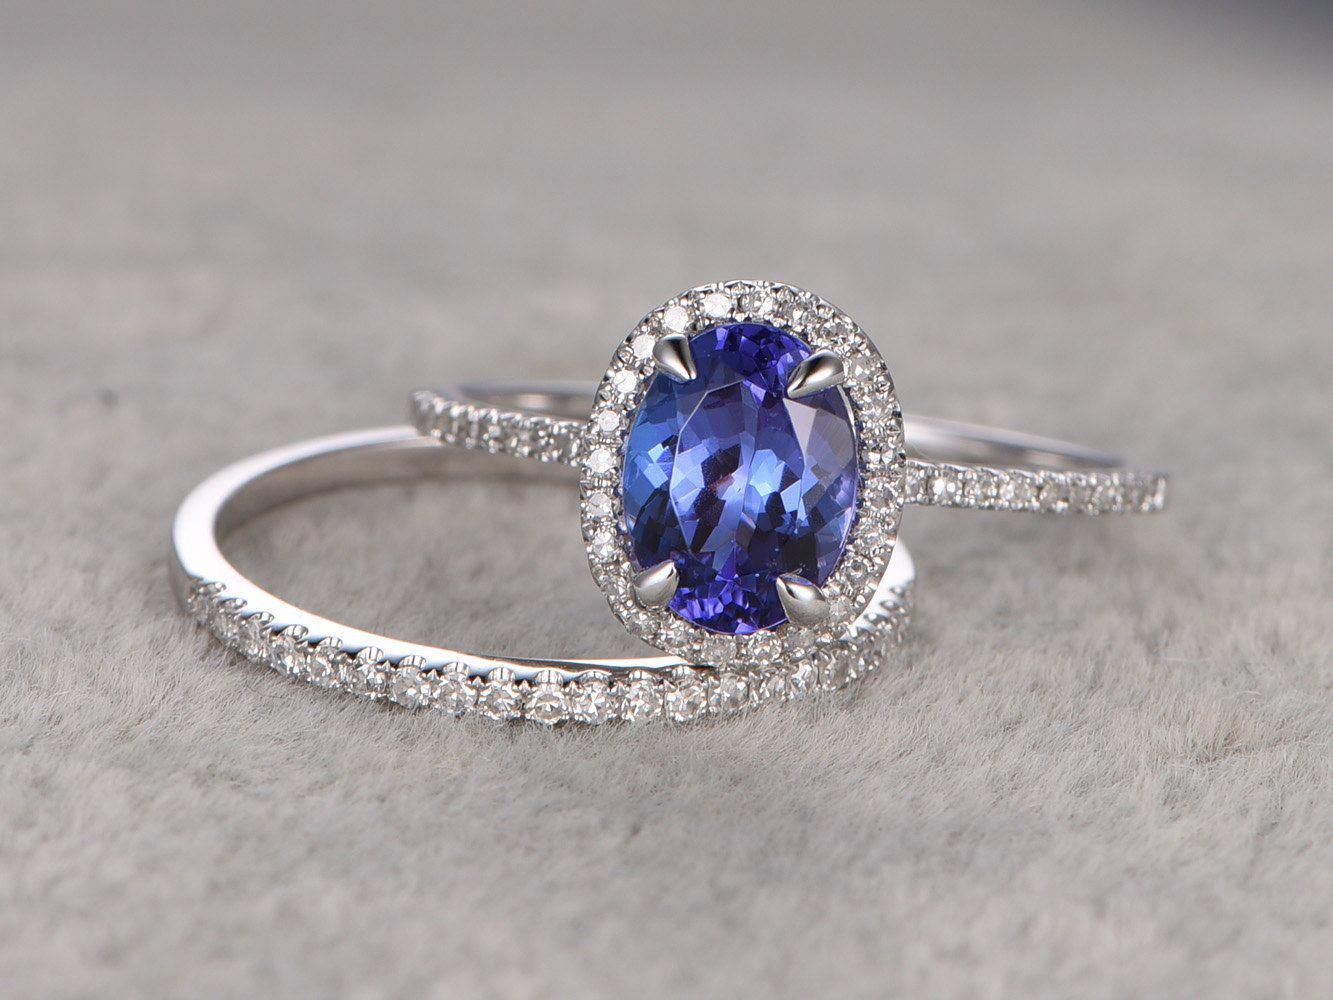 ctw Oval Tanzanite Engagement ringVS Diamond Promise RingK